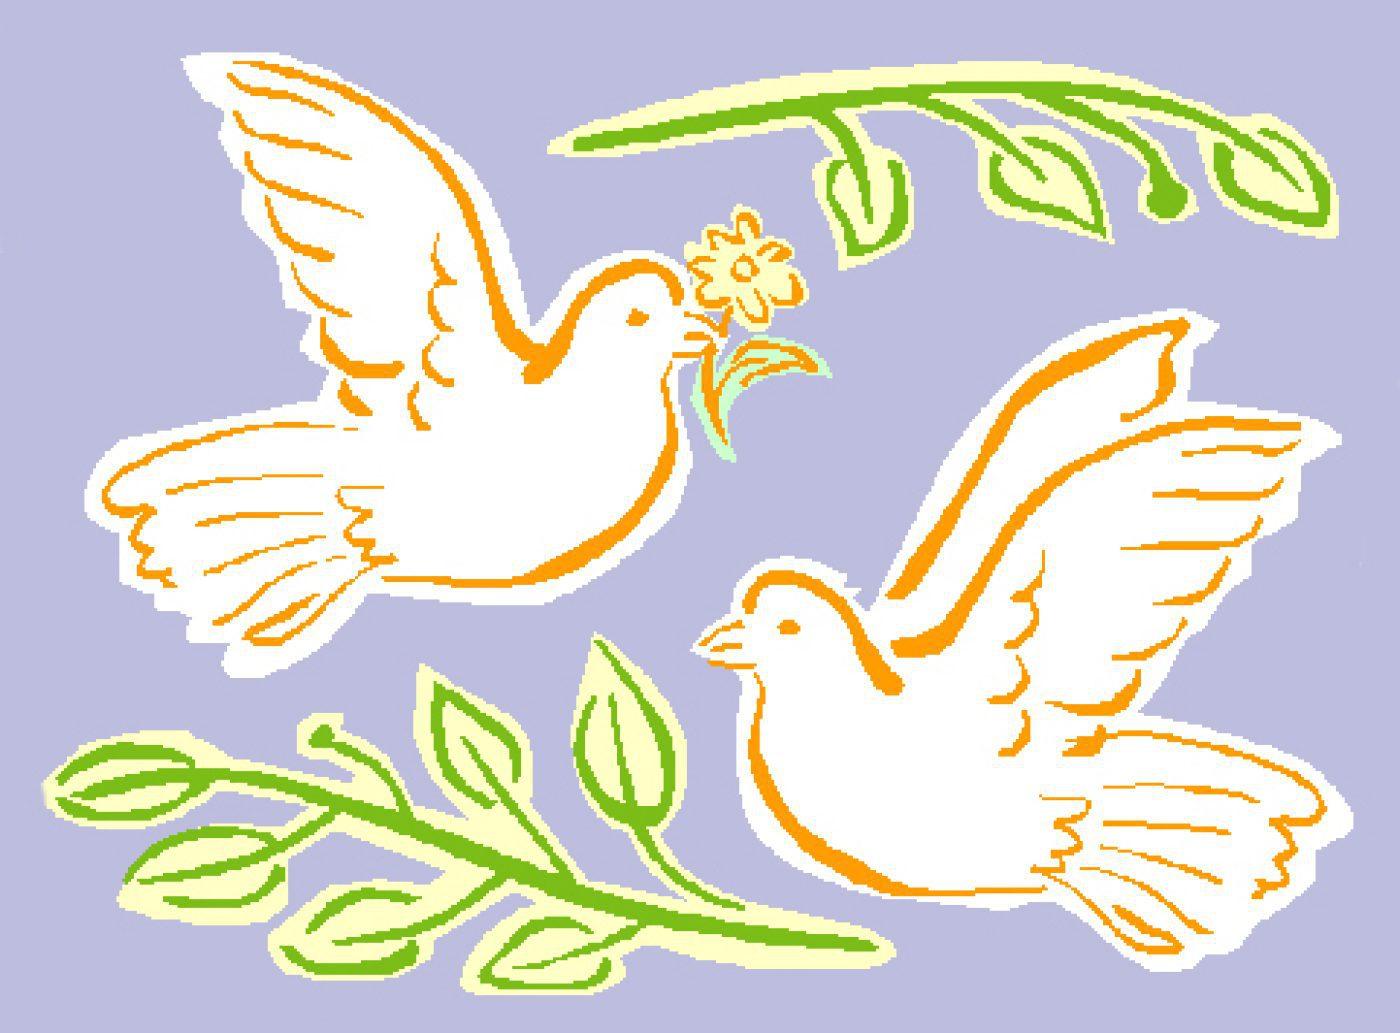 cropped-cropped-mupj-logo1.jpg